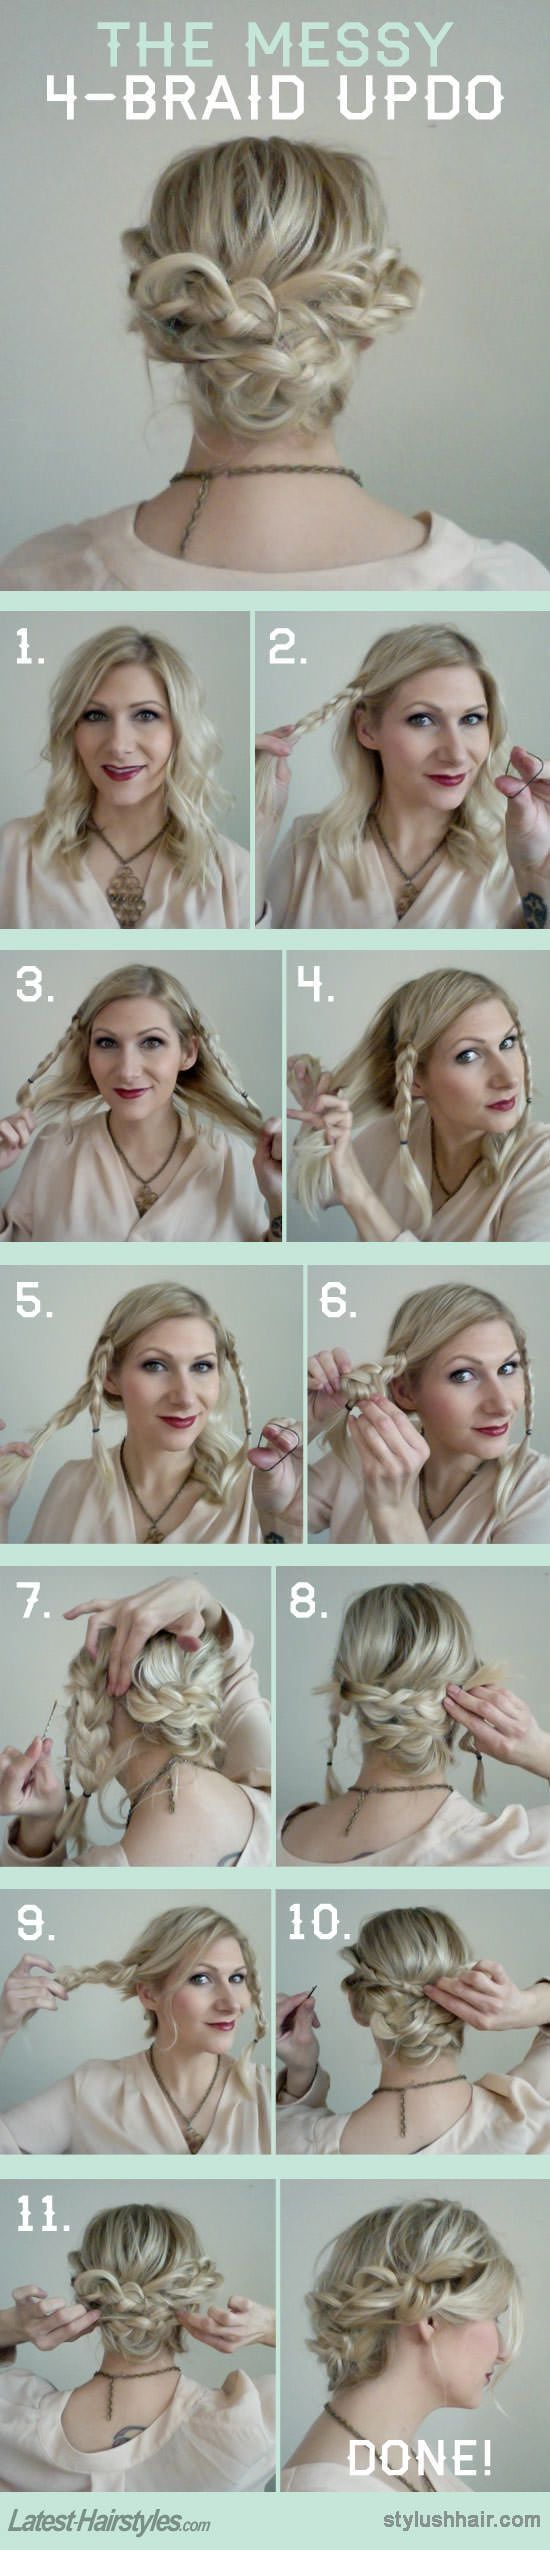 4 braid updo tutorial for medium length hair by bleu hair 4 braid updo tutorial for medium length hair by bleu solutioingenieria Gallery